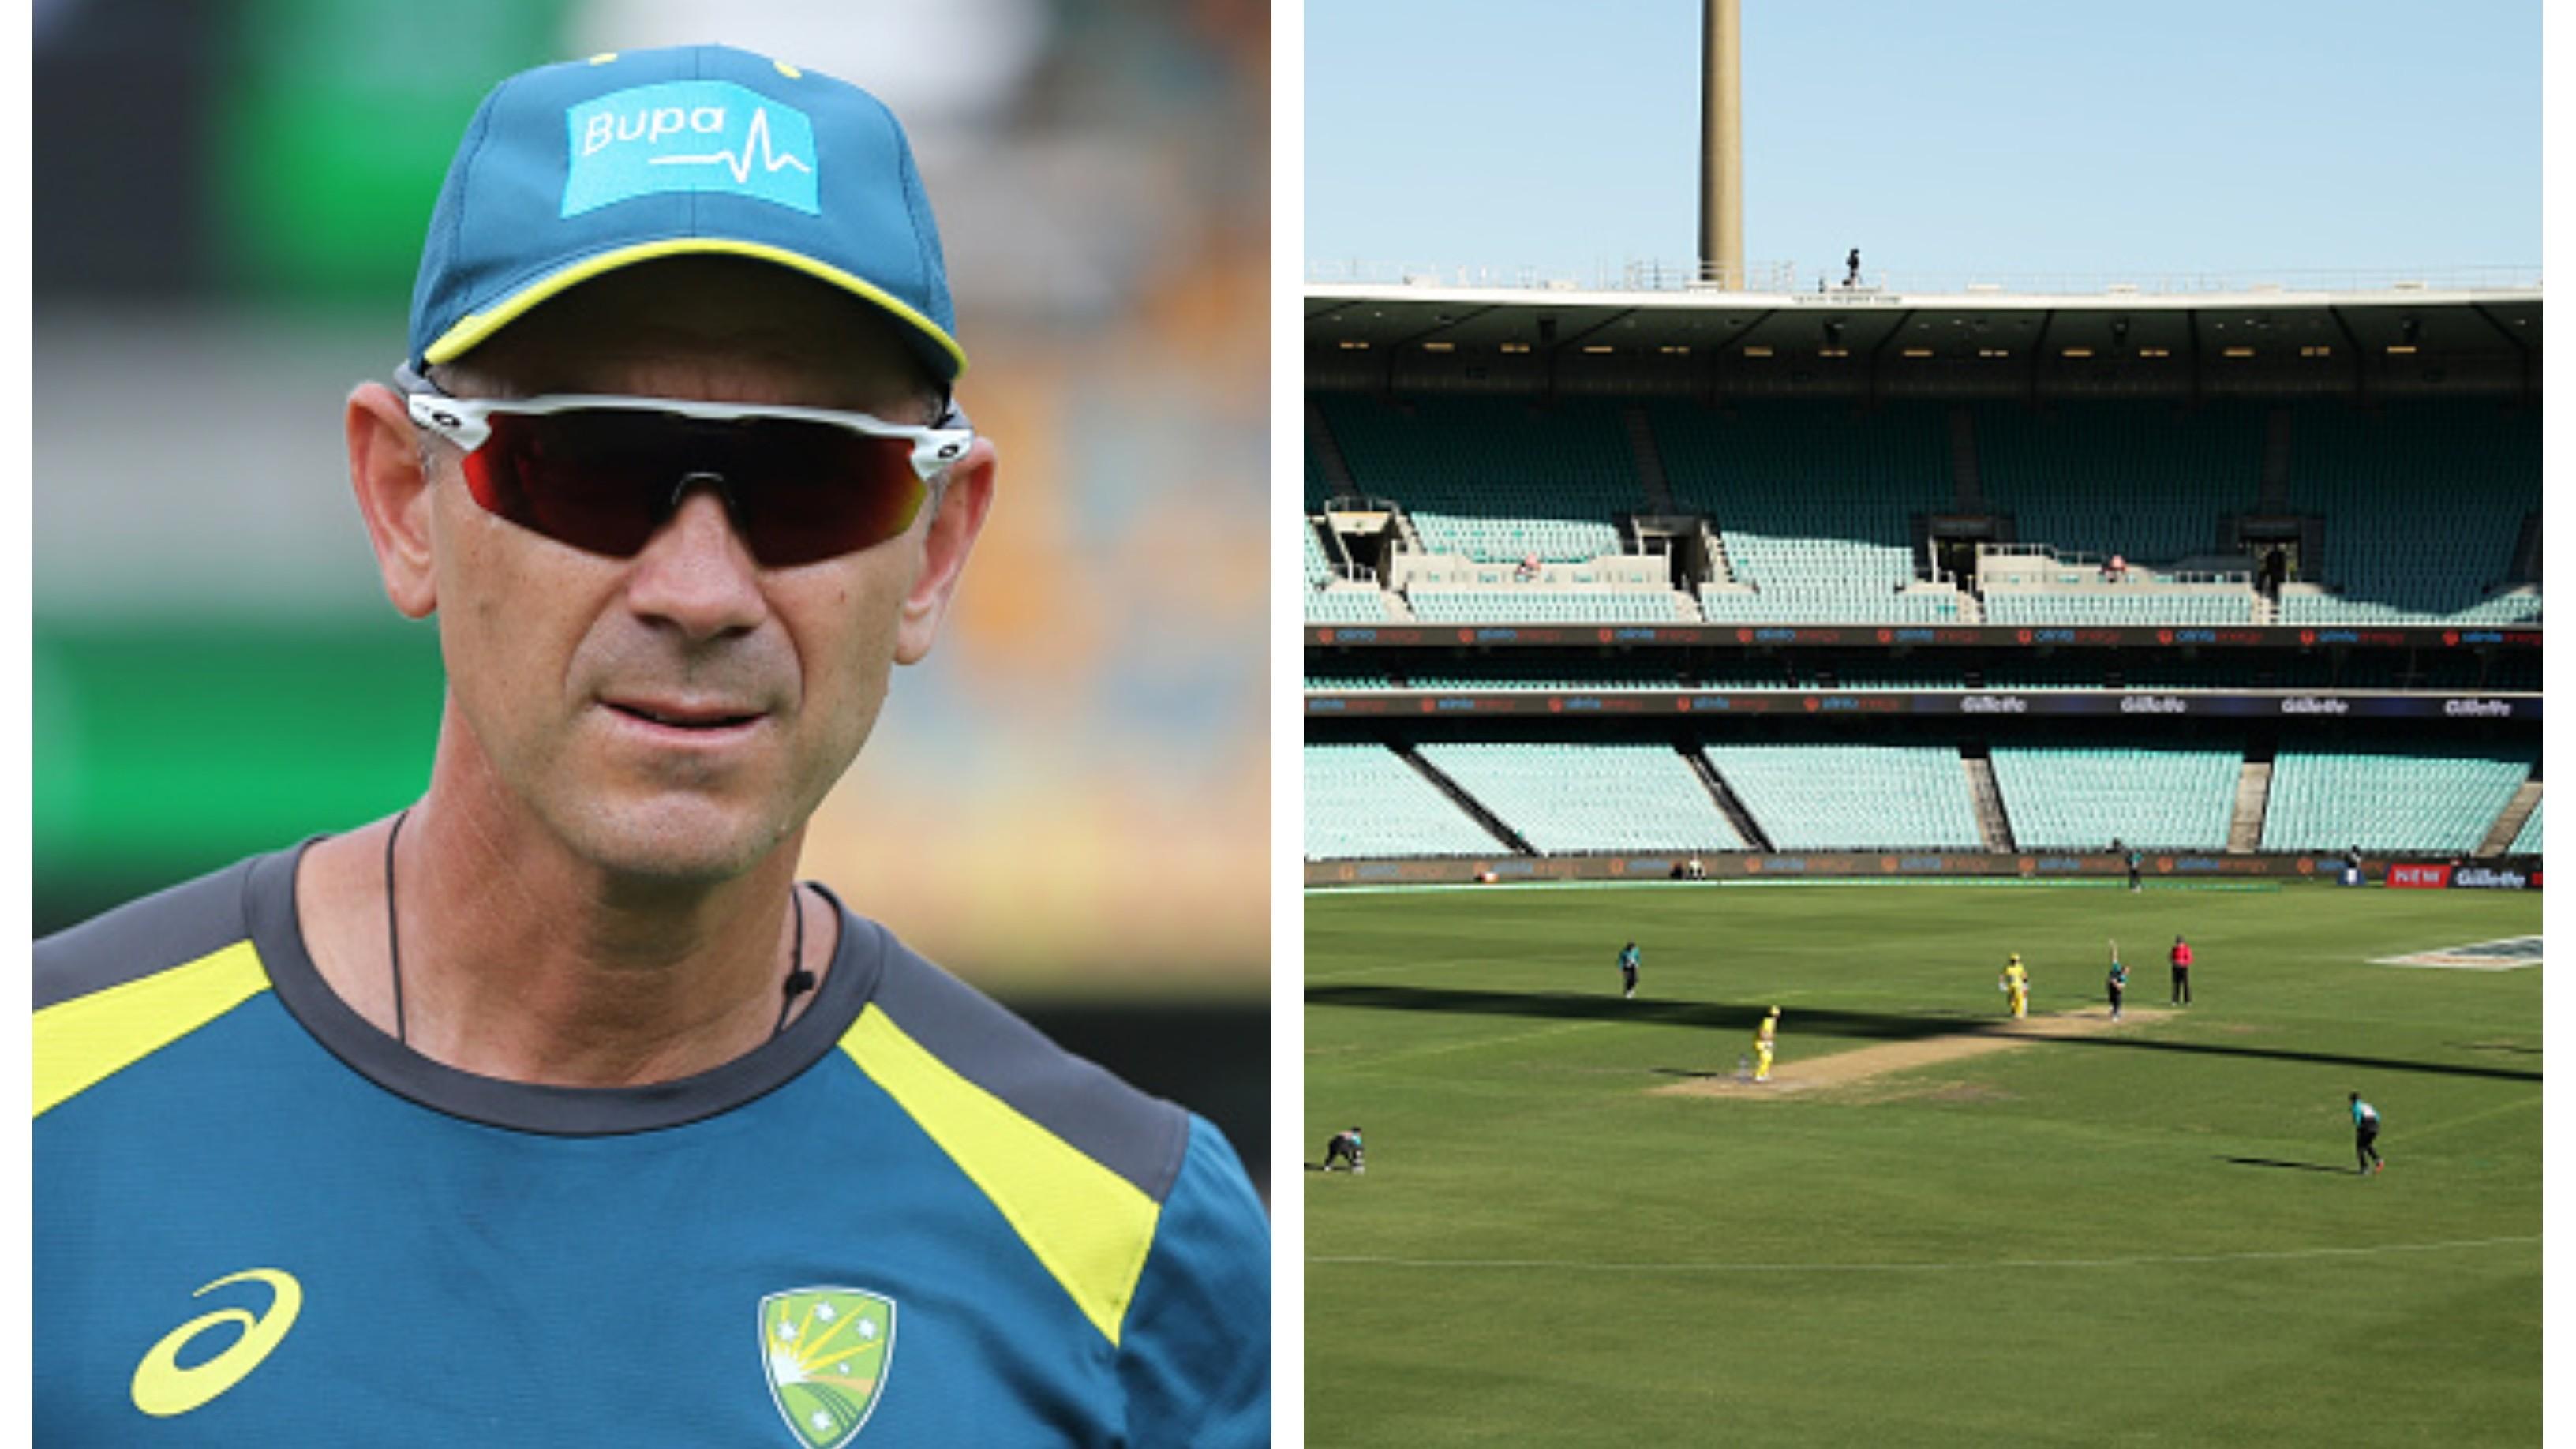 Justin Langer bats for cricket behind closed doors amid COVID-19 pandemic